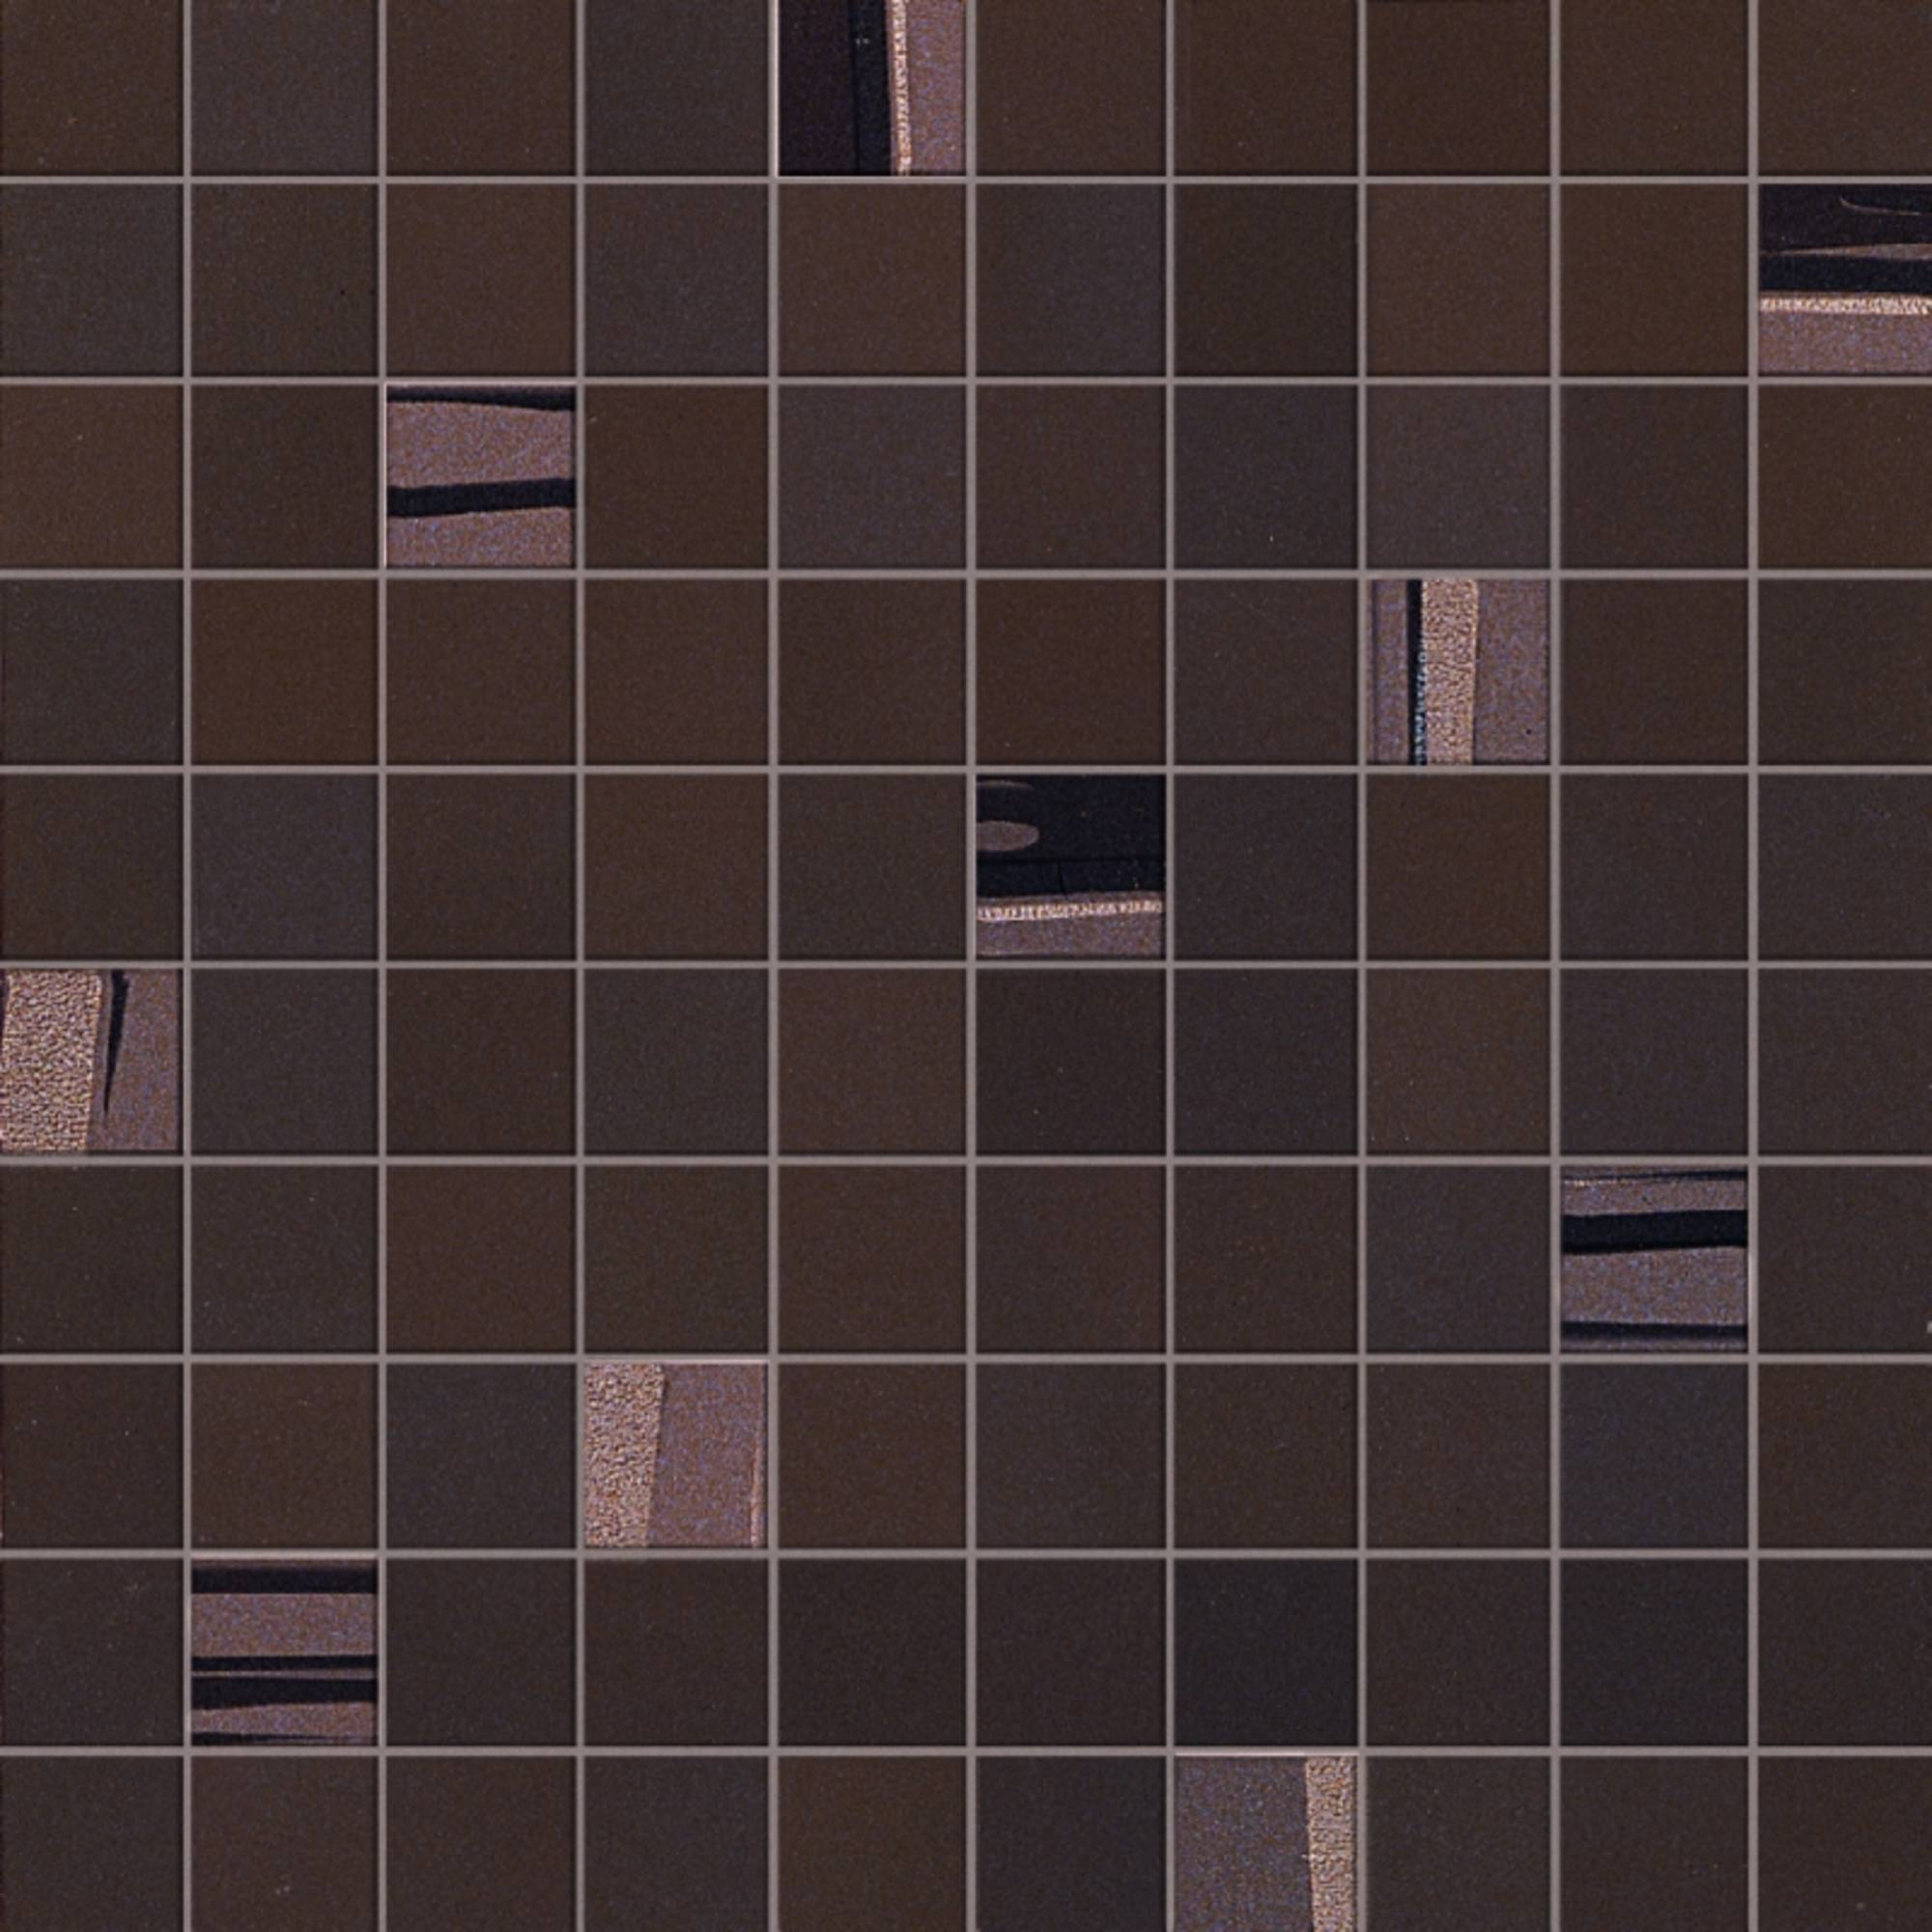 ATLAS CONCORDE INTENSITY tegelmat 30,5 x 30,5 cm. doos a 6 vel square COCOA (8XS2)